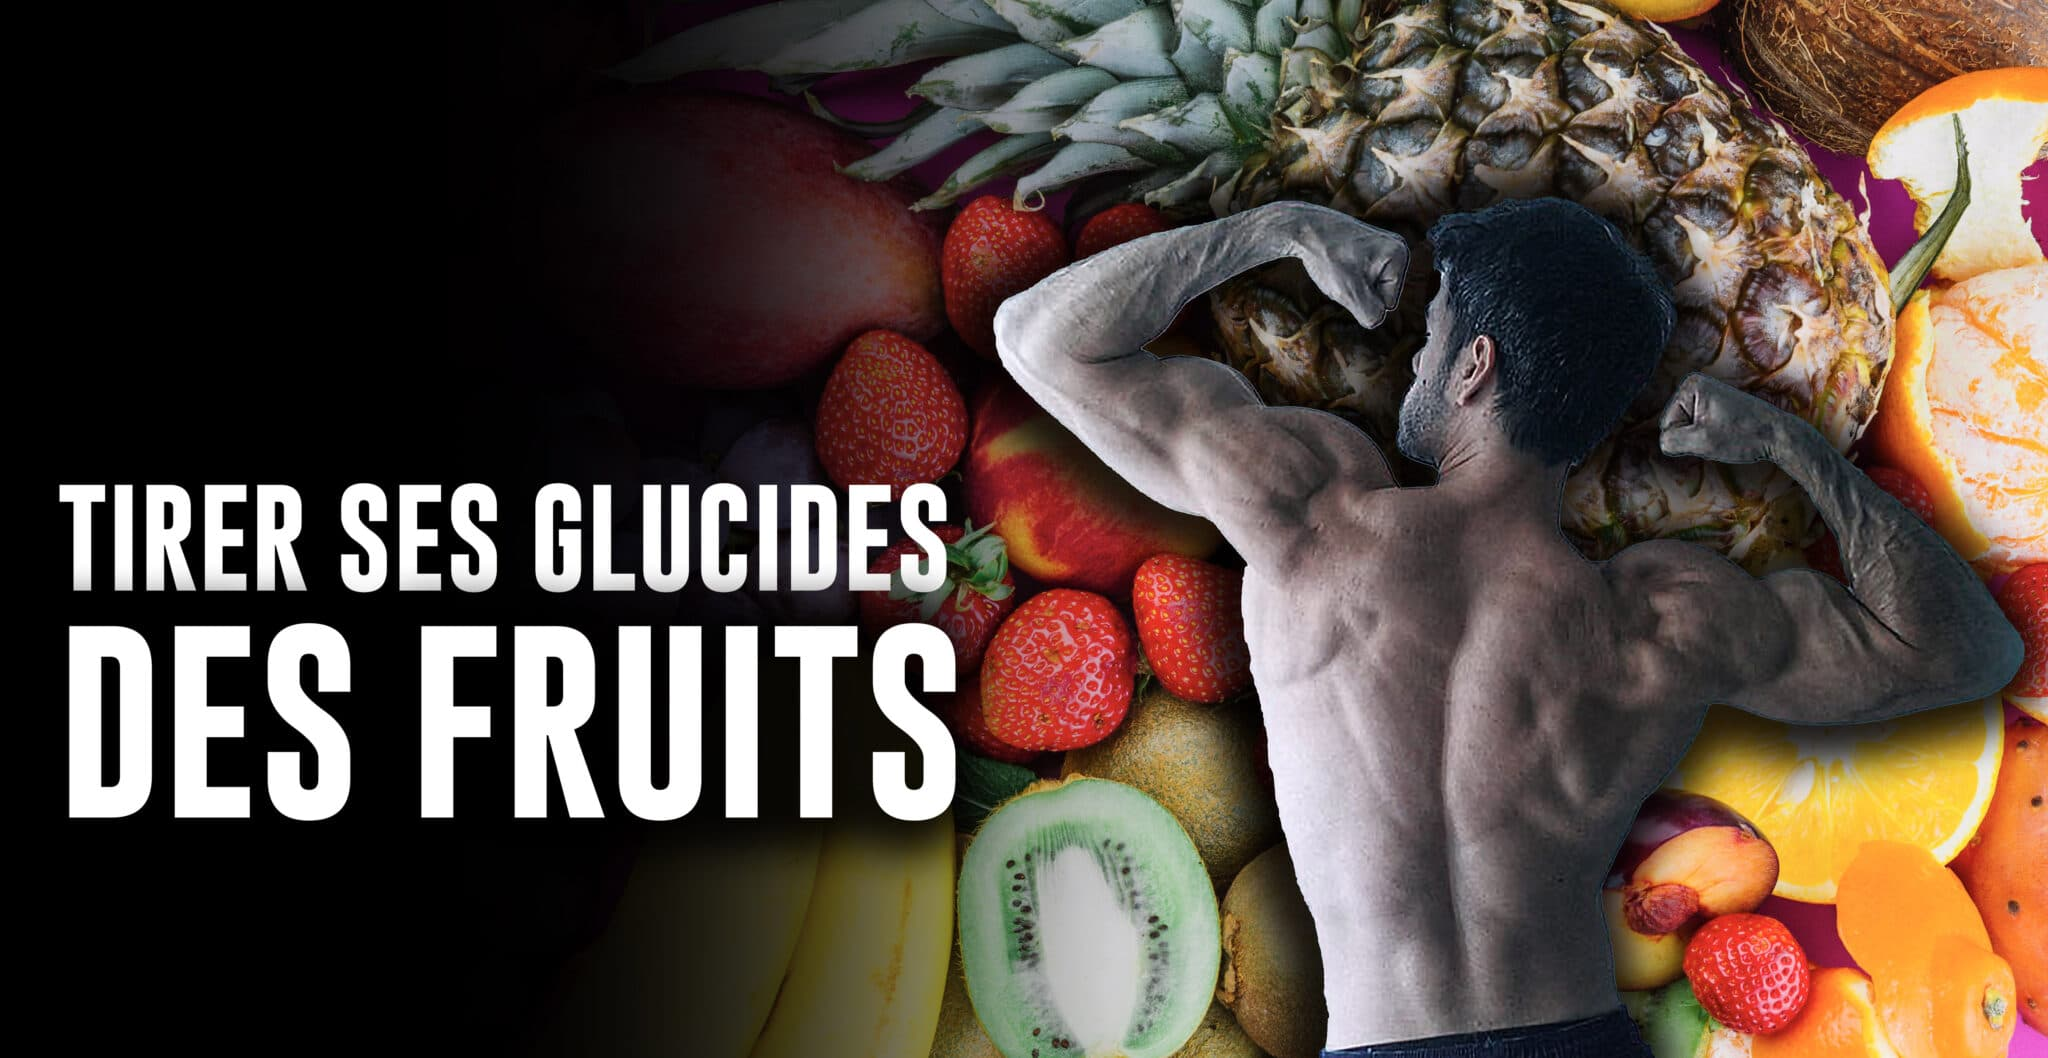 fruit musculation prise de masse